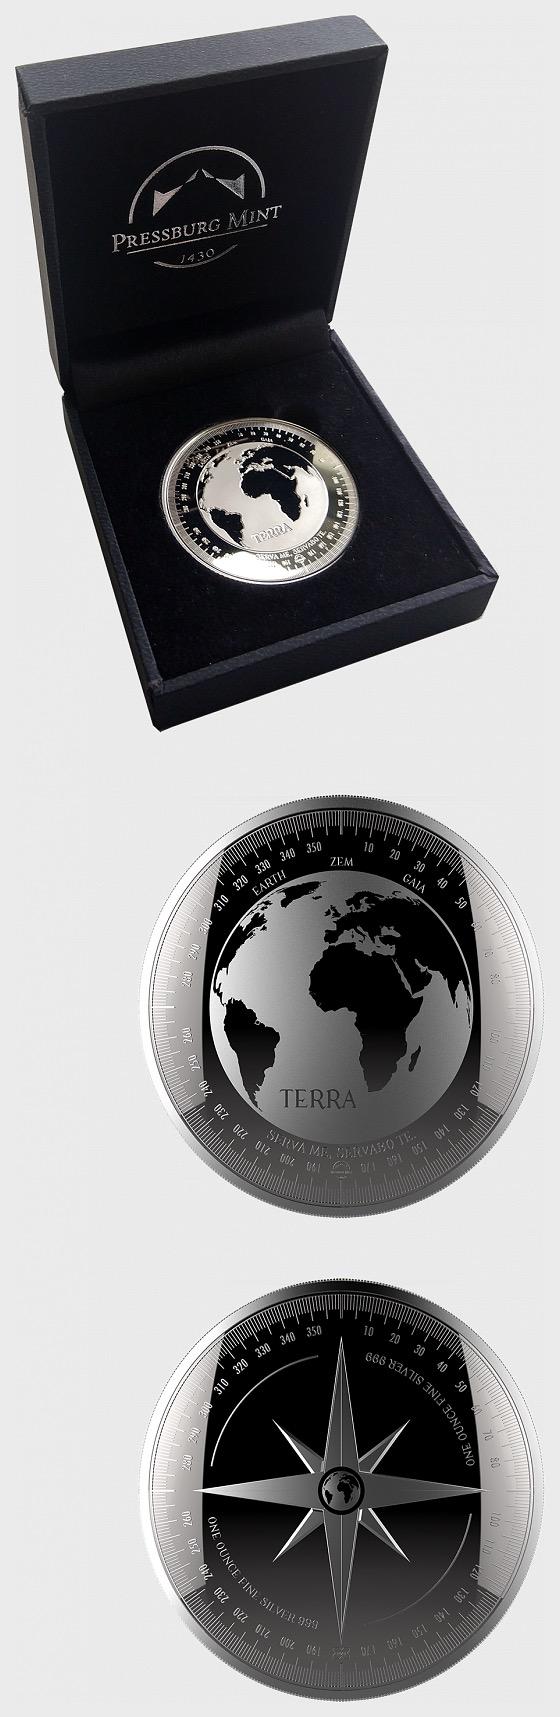 Terra - Brilliant Uncirculated - Gift Box - Silver Bullion